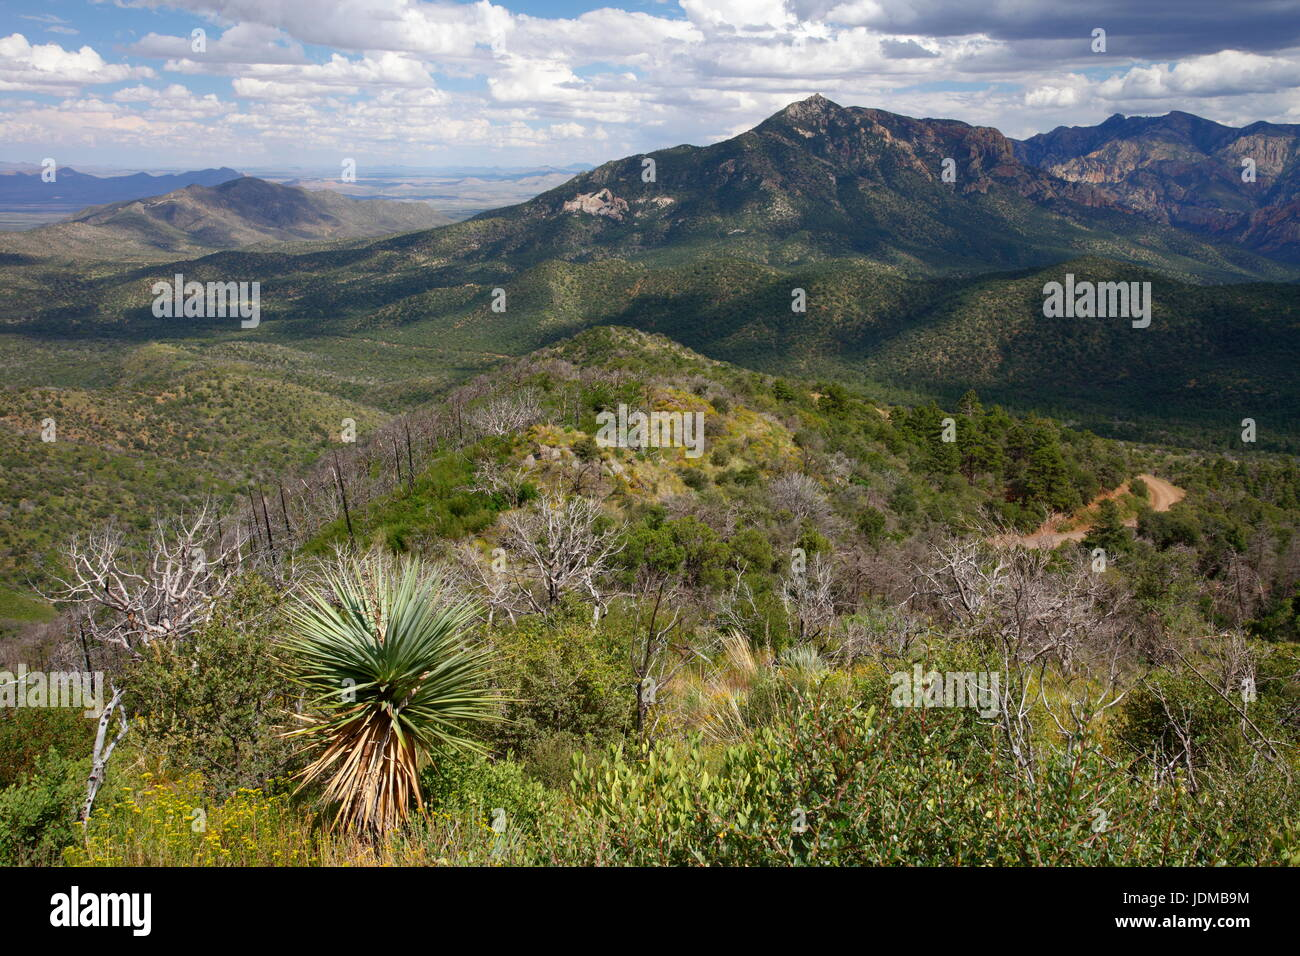 The Chiricahua mountains in southeastern Arizona. - Stock Image